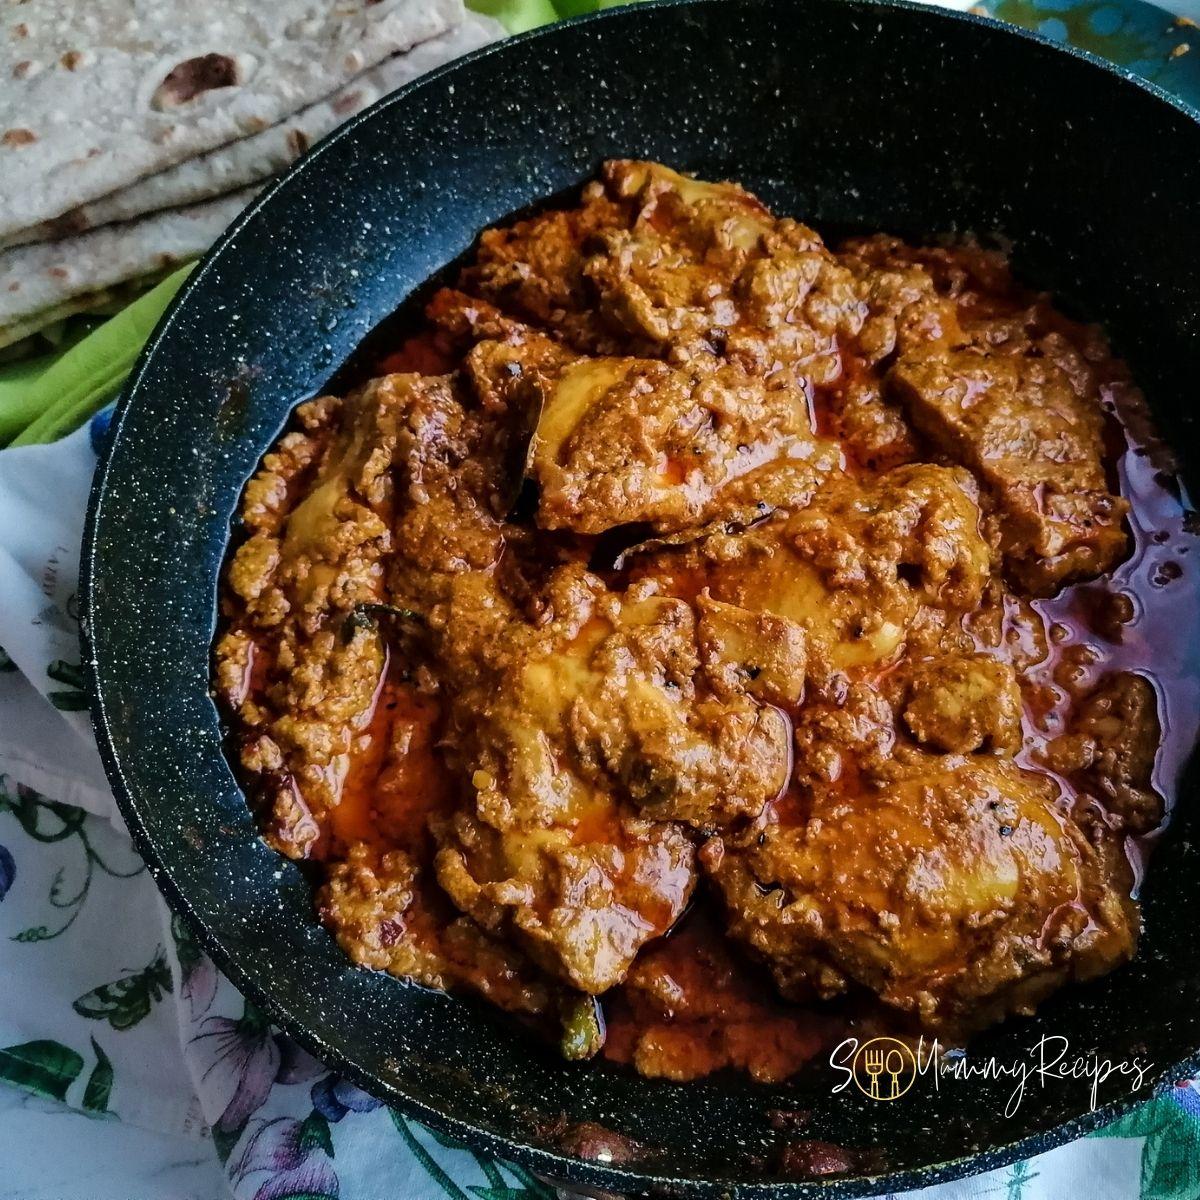 Pakistani Achari Chicken in a pan